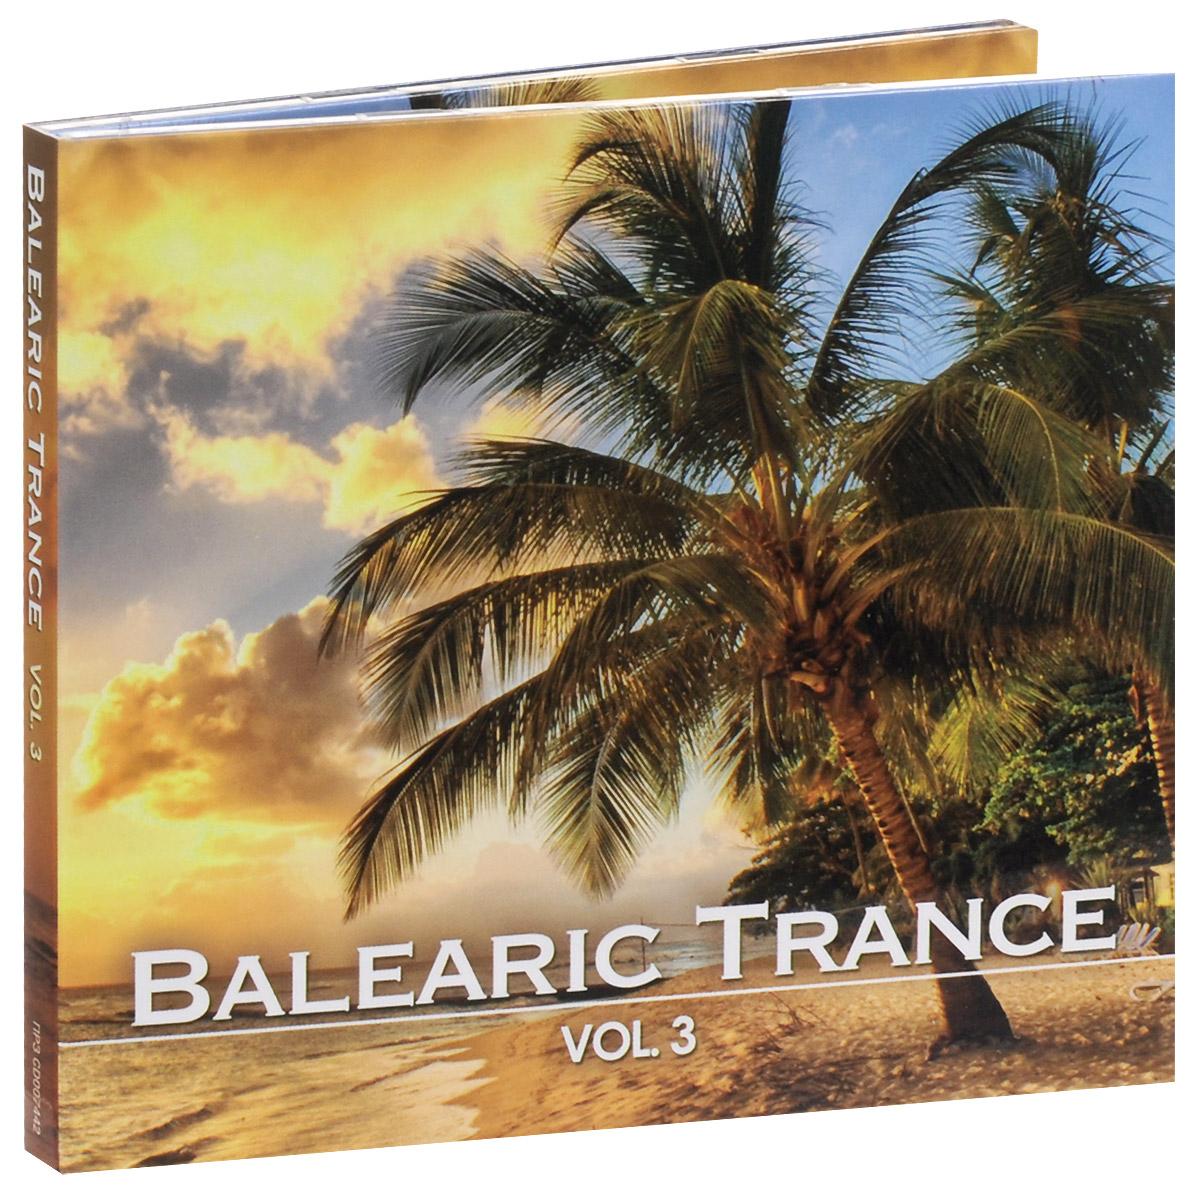 Balearic Trance Vol. 3 (2 CD) 2014 Audio CD